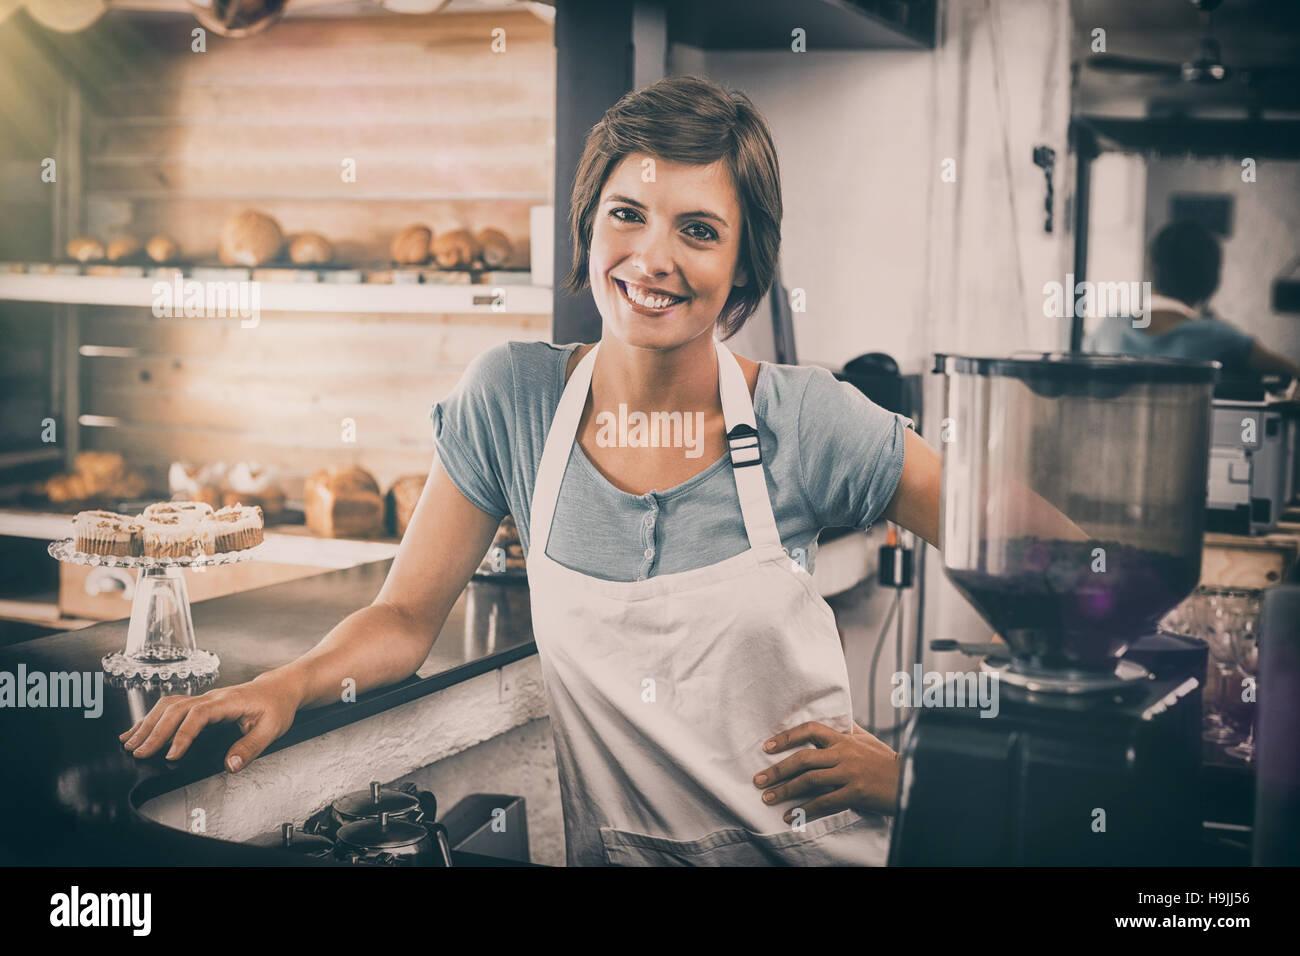 Pretty barista smiling at camera - Stock Image